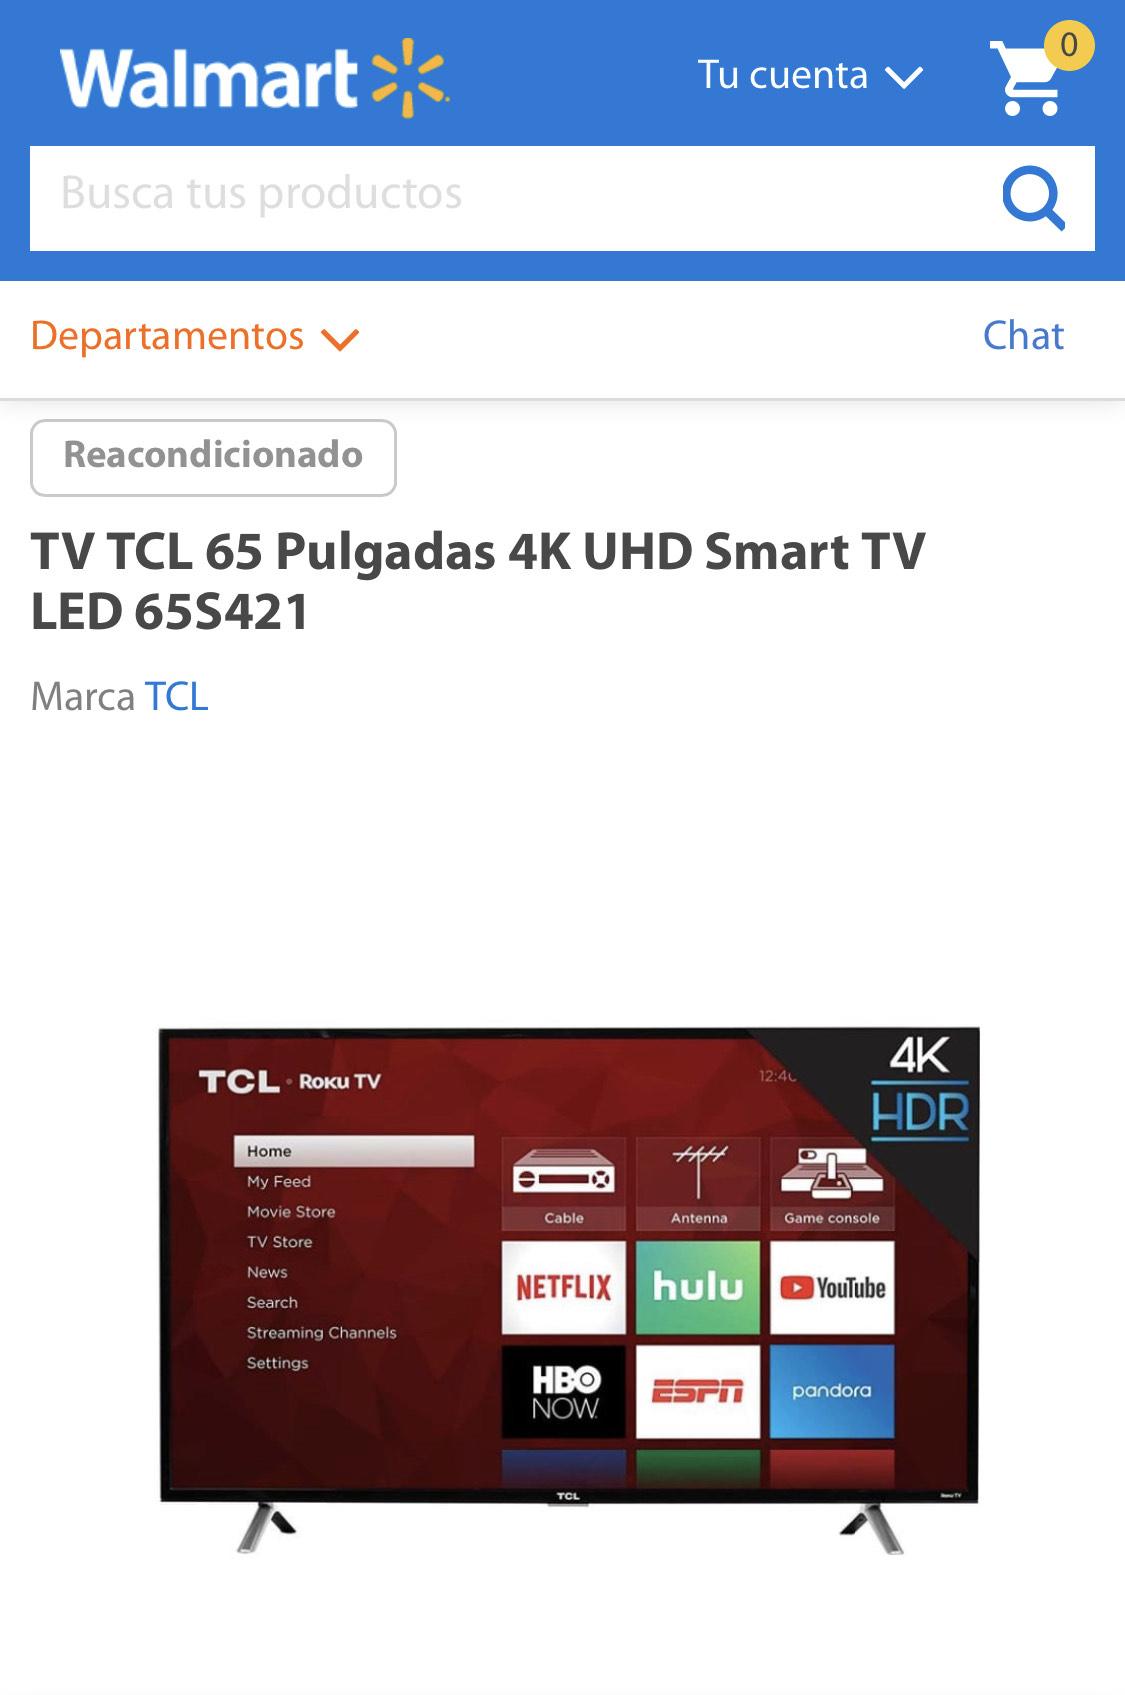 Walmart: TV TCL 65 Pulgadas 4K UHD Smart TV LED 65S421 reacondicionada